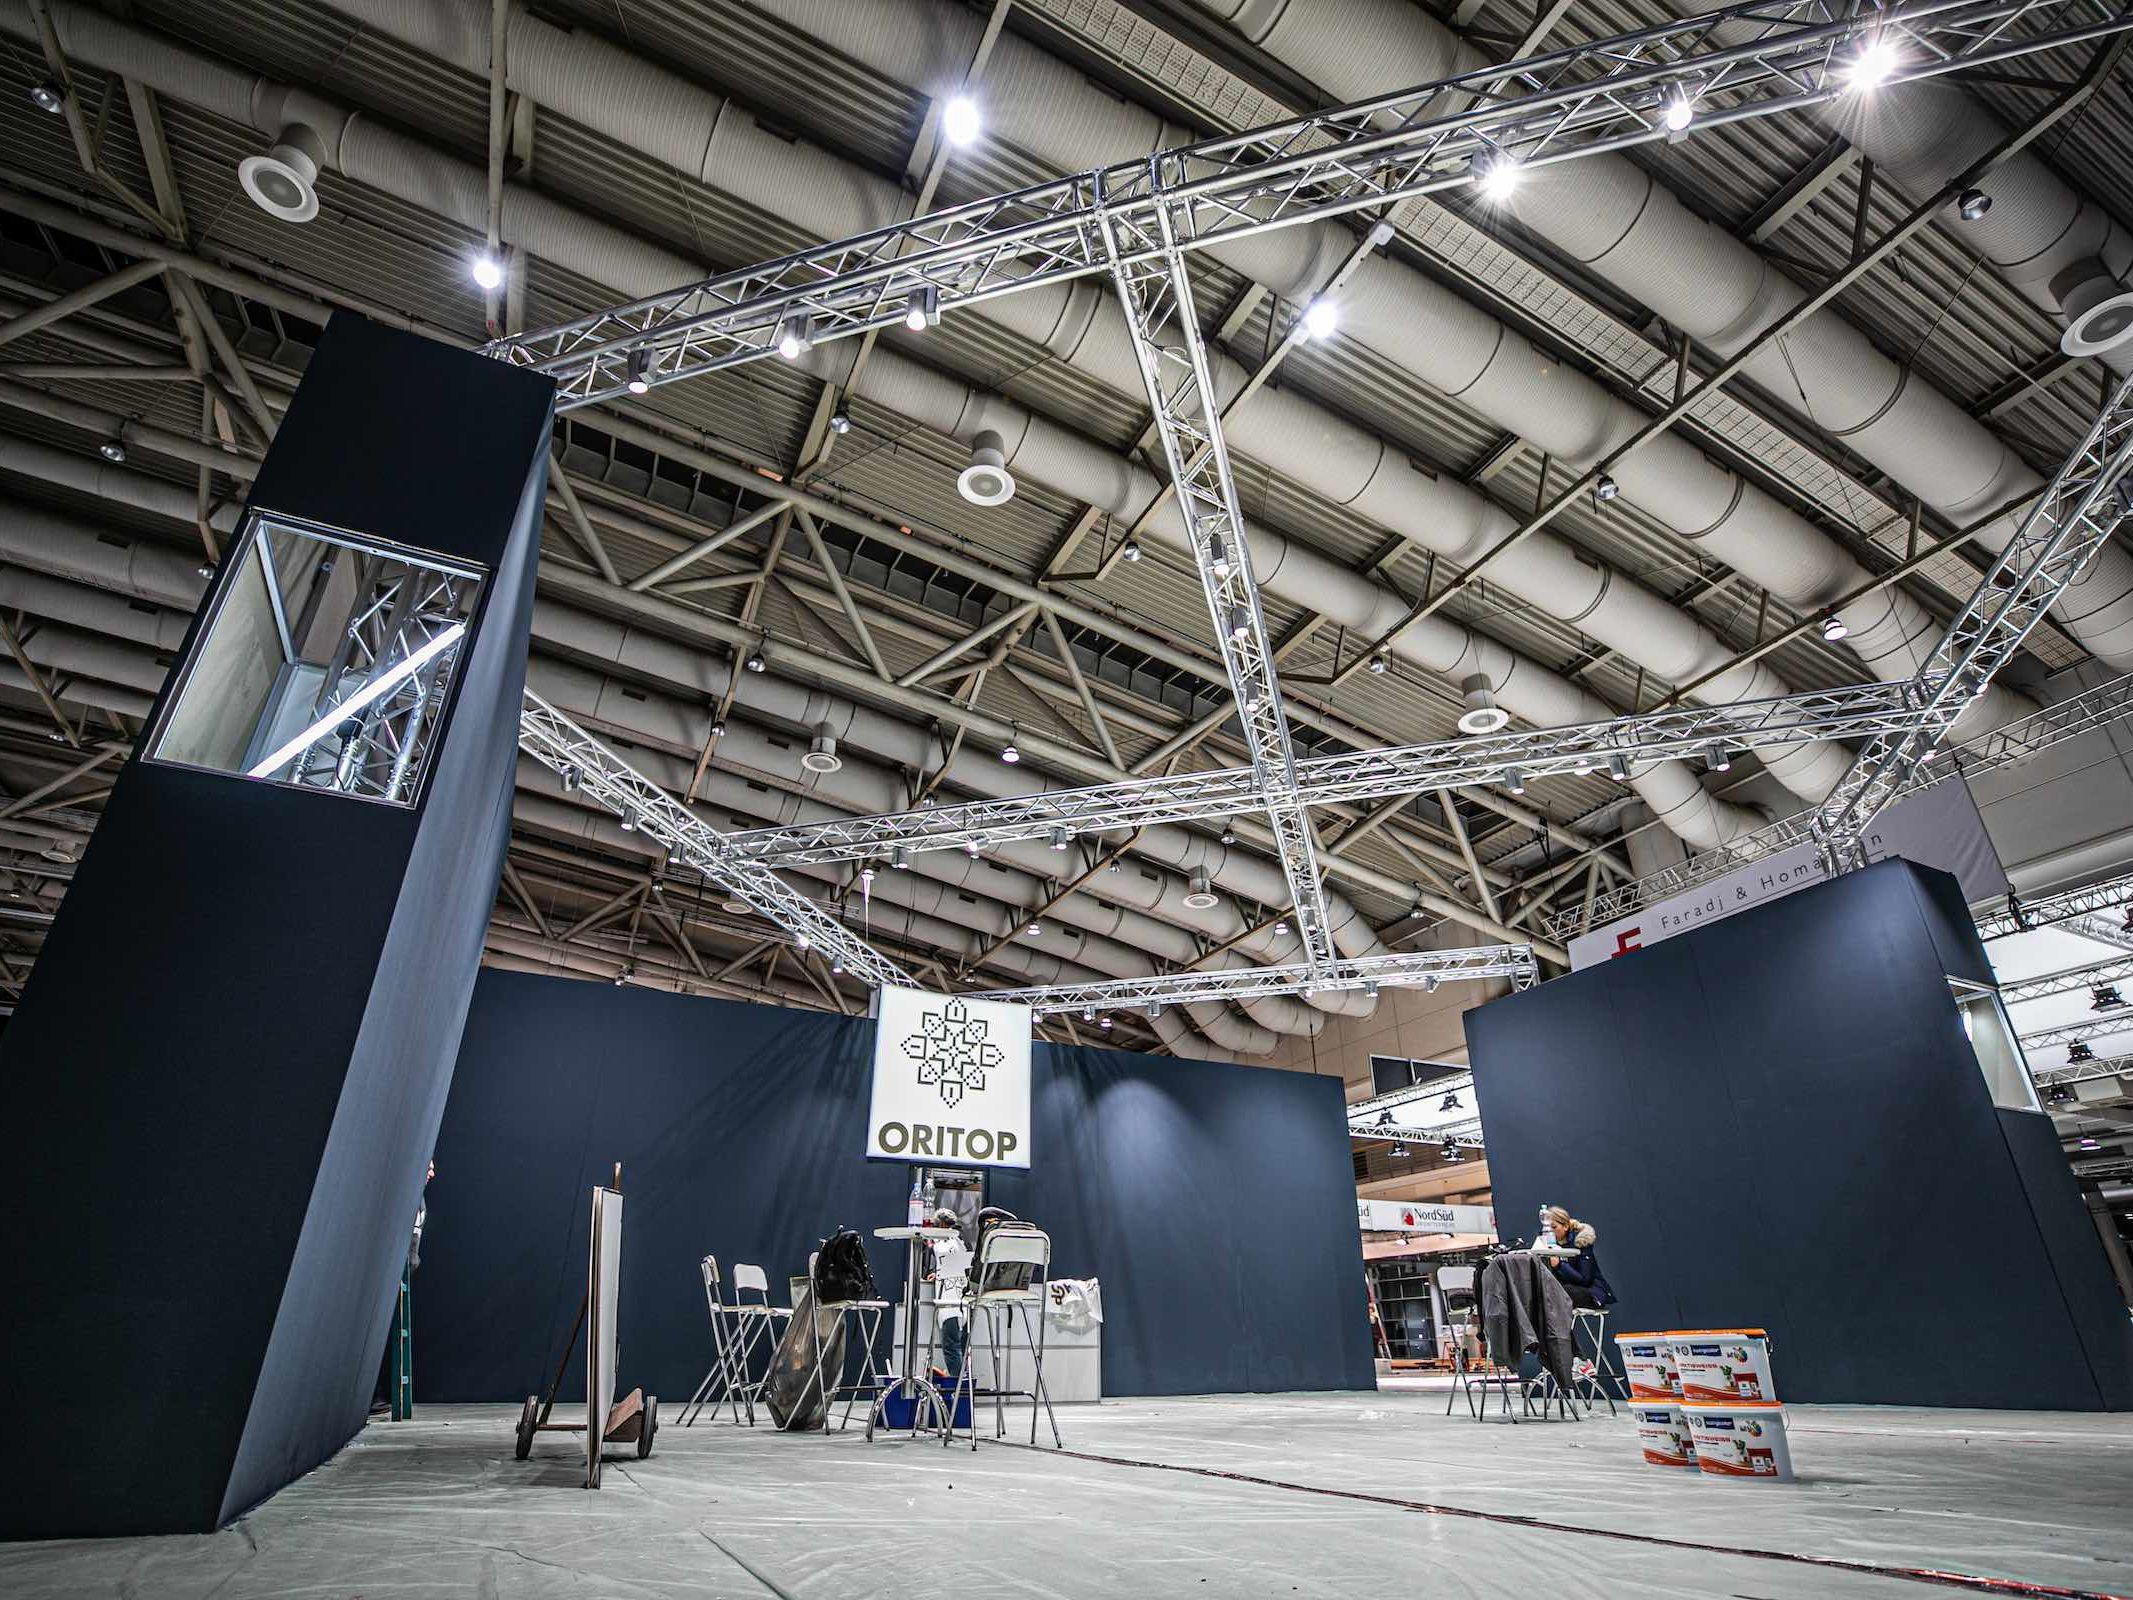 Messebau | Hannover | Traversen | Eventtechnik | Lichttechnik | Tontechnik | Beschallung | Planung | Konzeption | Lieferung | Mieten | Anfragen | Buchen | Lehmann | Eventservice